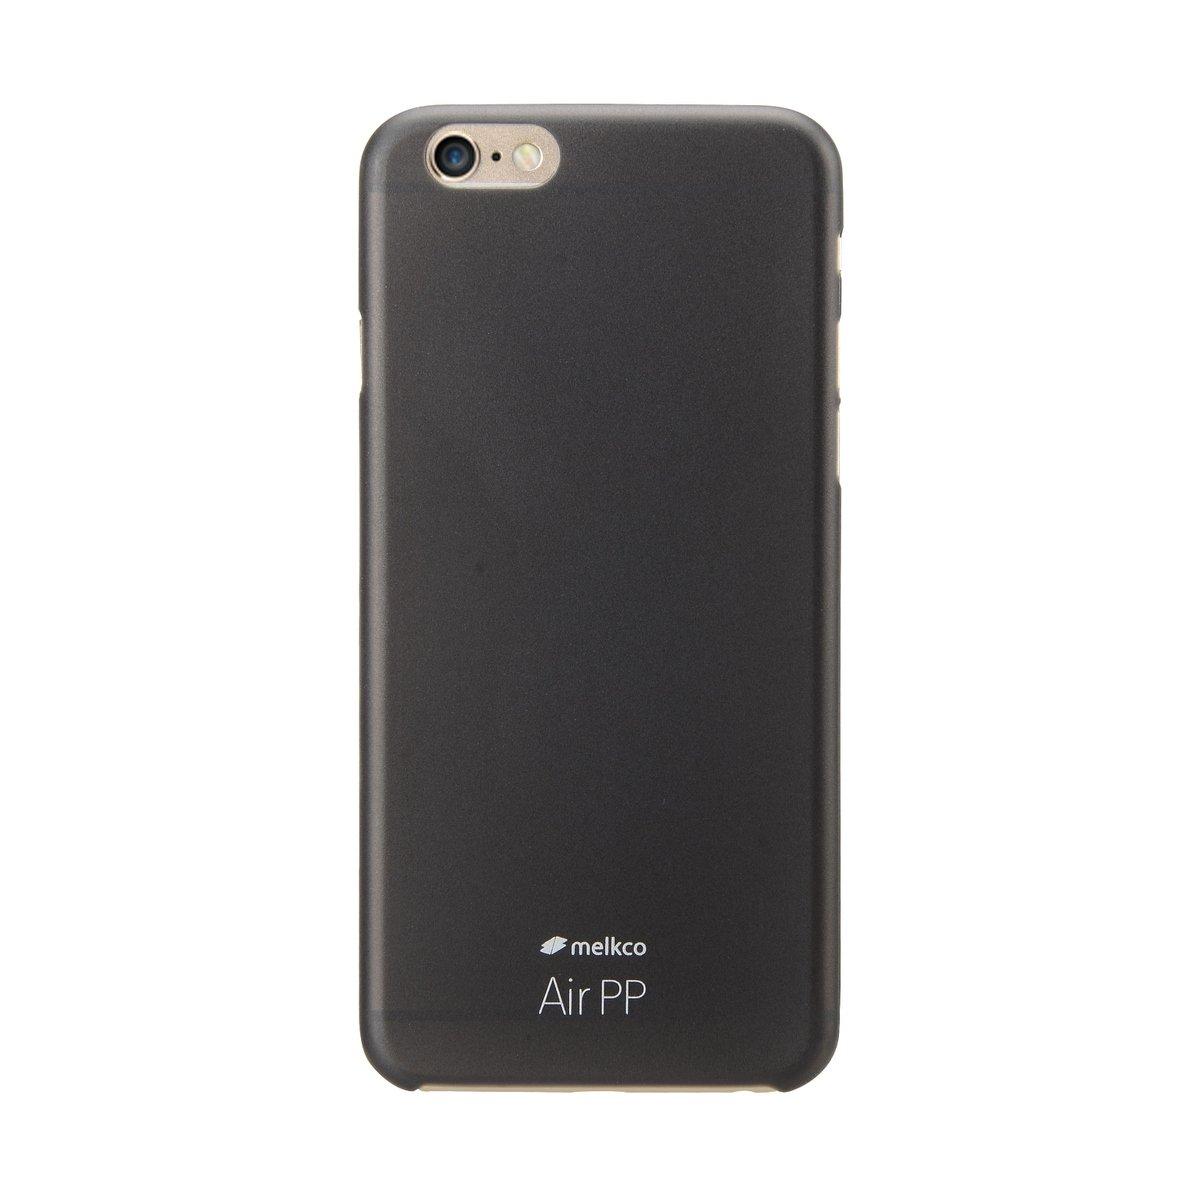 "iPhone 6 Plus/6S Plus (5.5"") Air PP 超薄防刮殼 - 黑色(附送屏幕保護貼)"